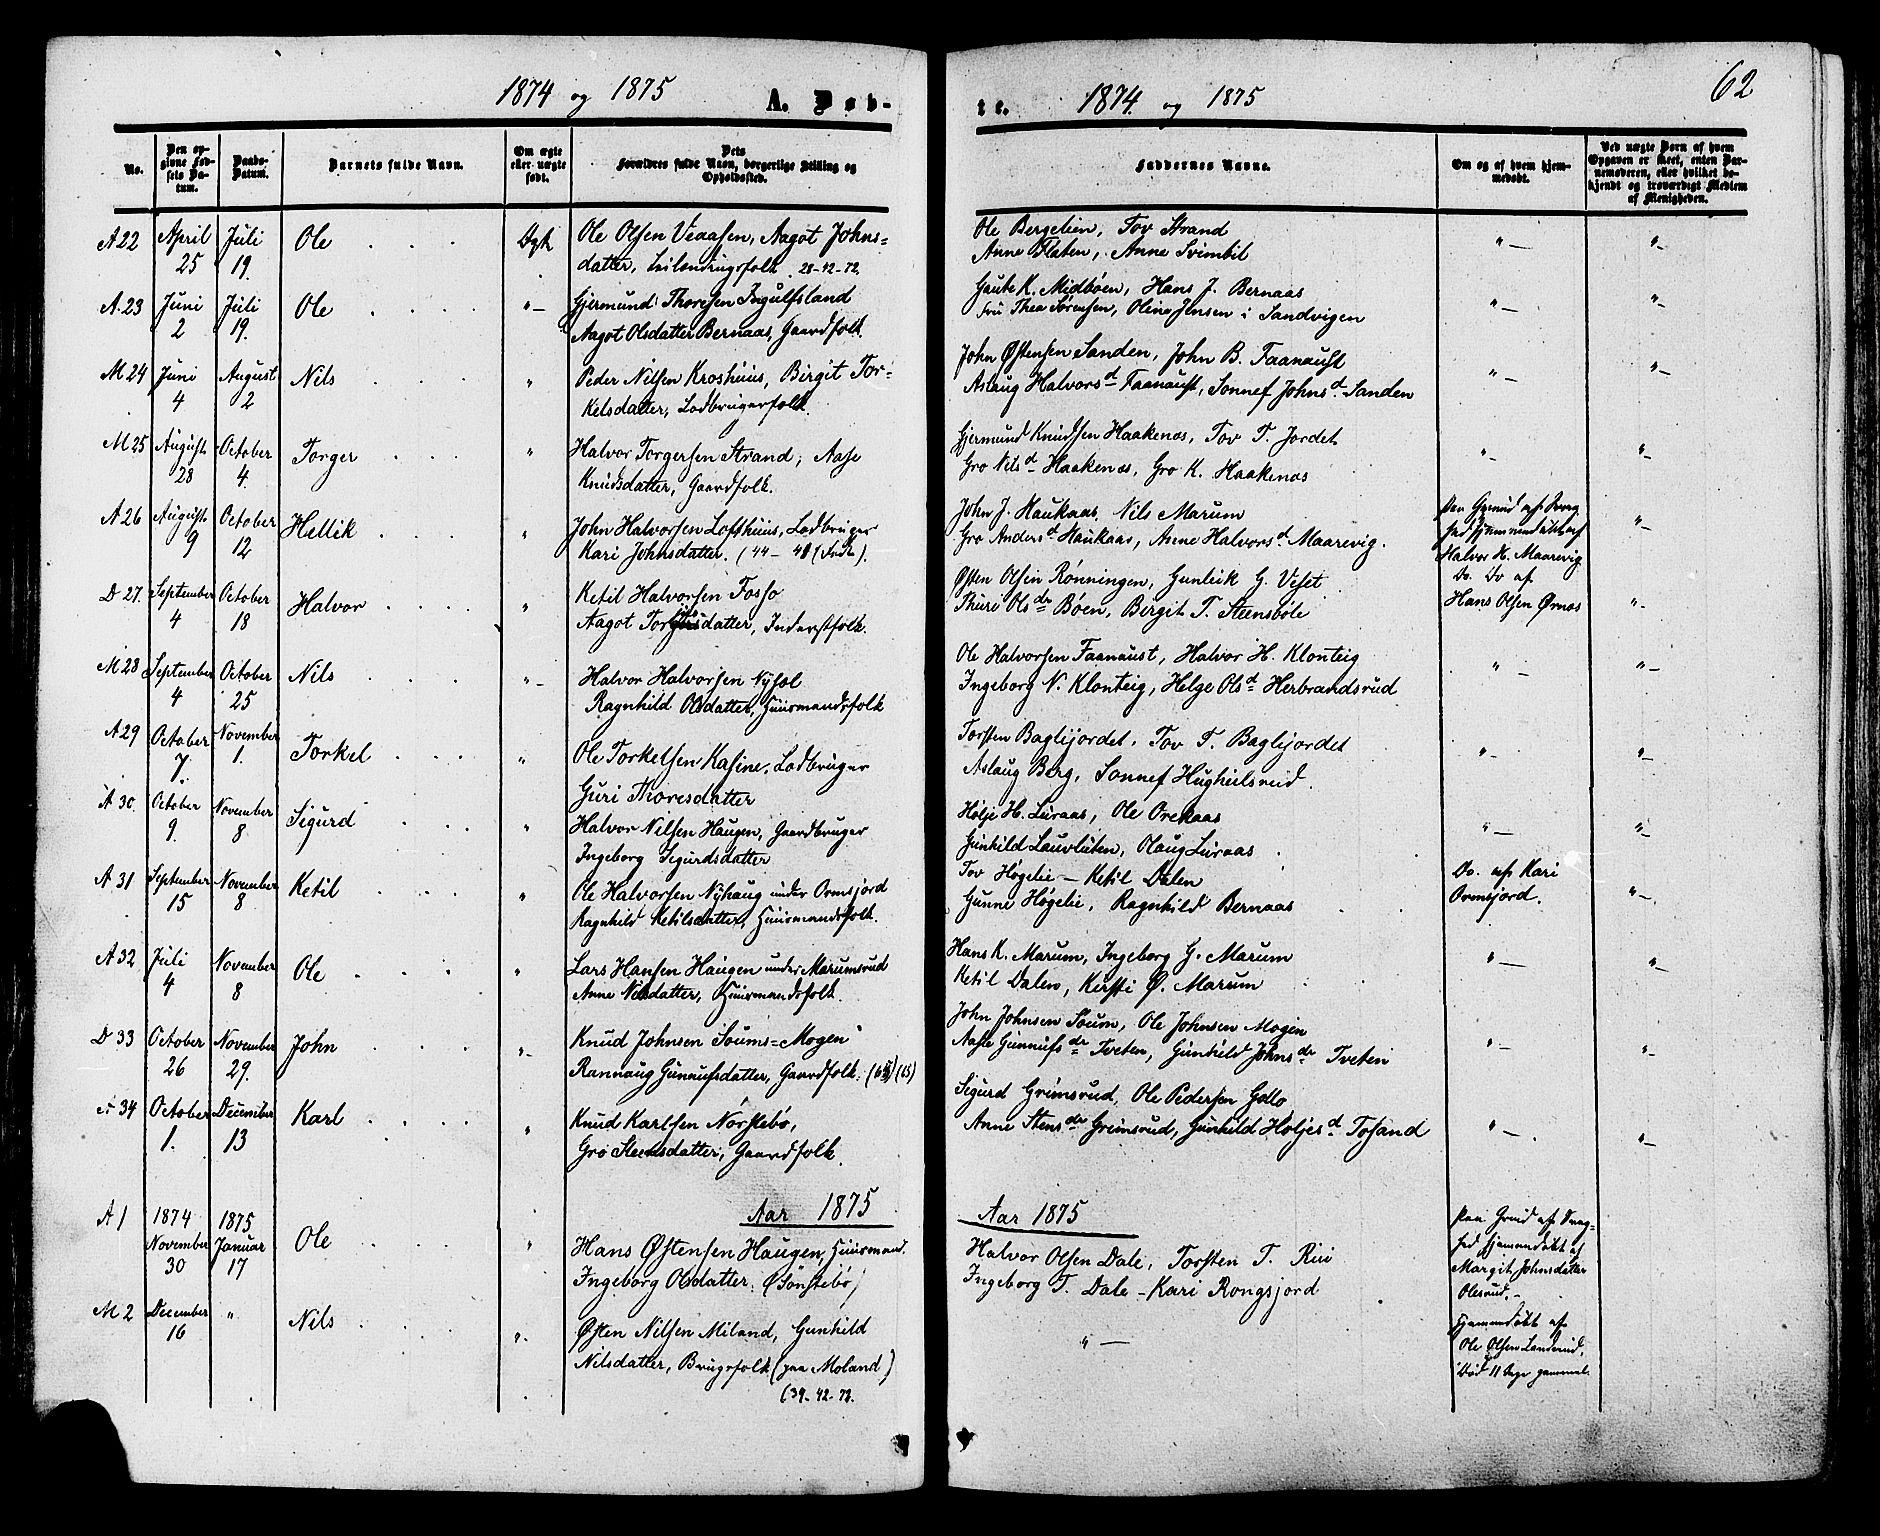 SAKO, Tinn kirkebøker, F/Fa/L0006: Ministerialbok nr. I 6, 1857-1878, s. 62